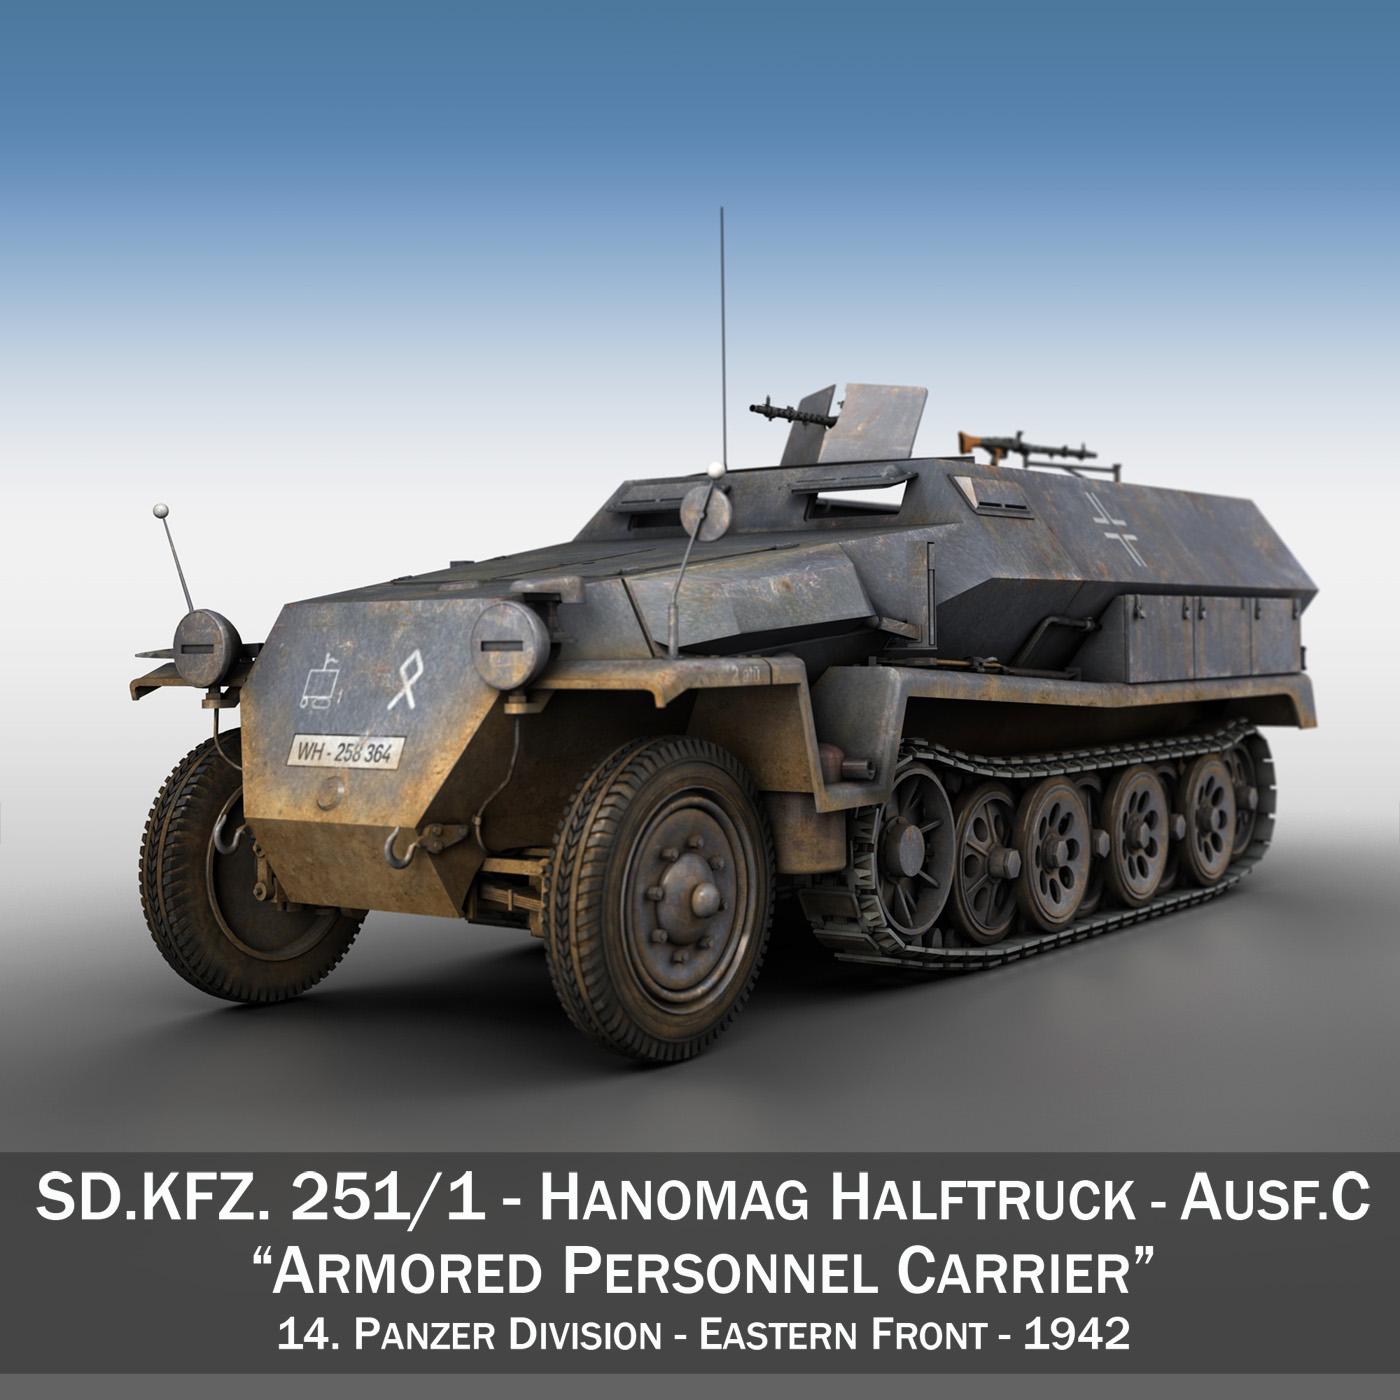 sd.kfz 251 1 ausf.c – half-track 3d model 3ds fbx c4d lwo obj 201390